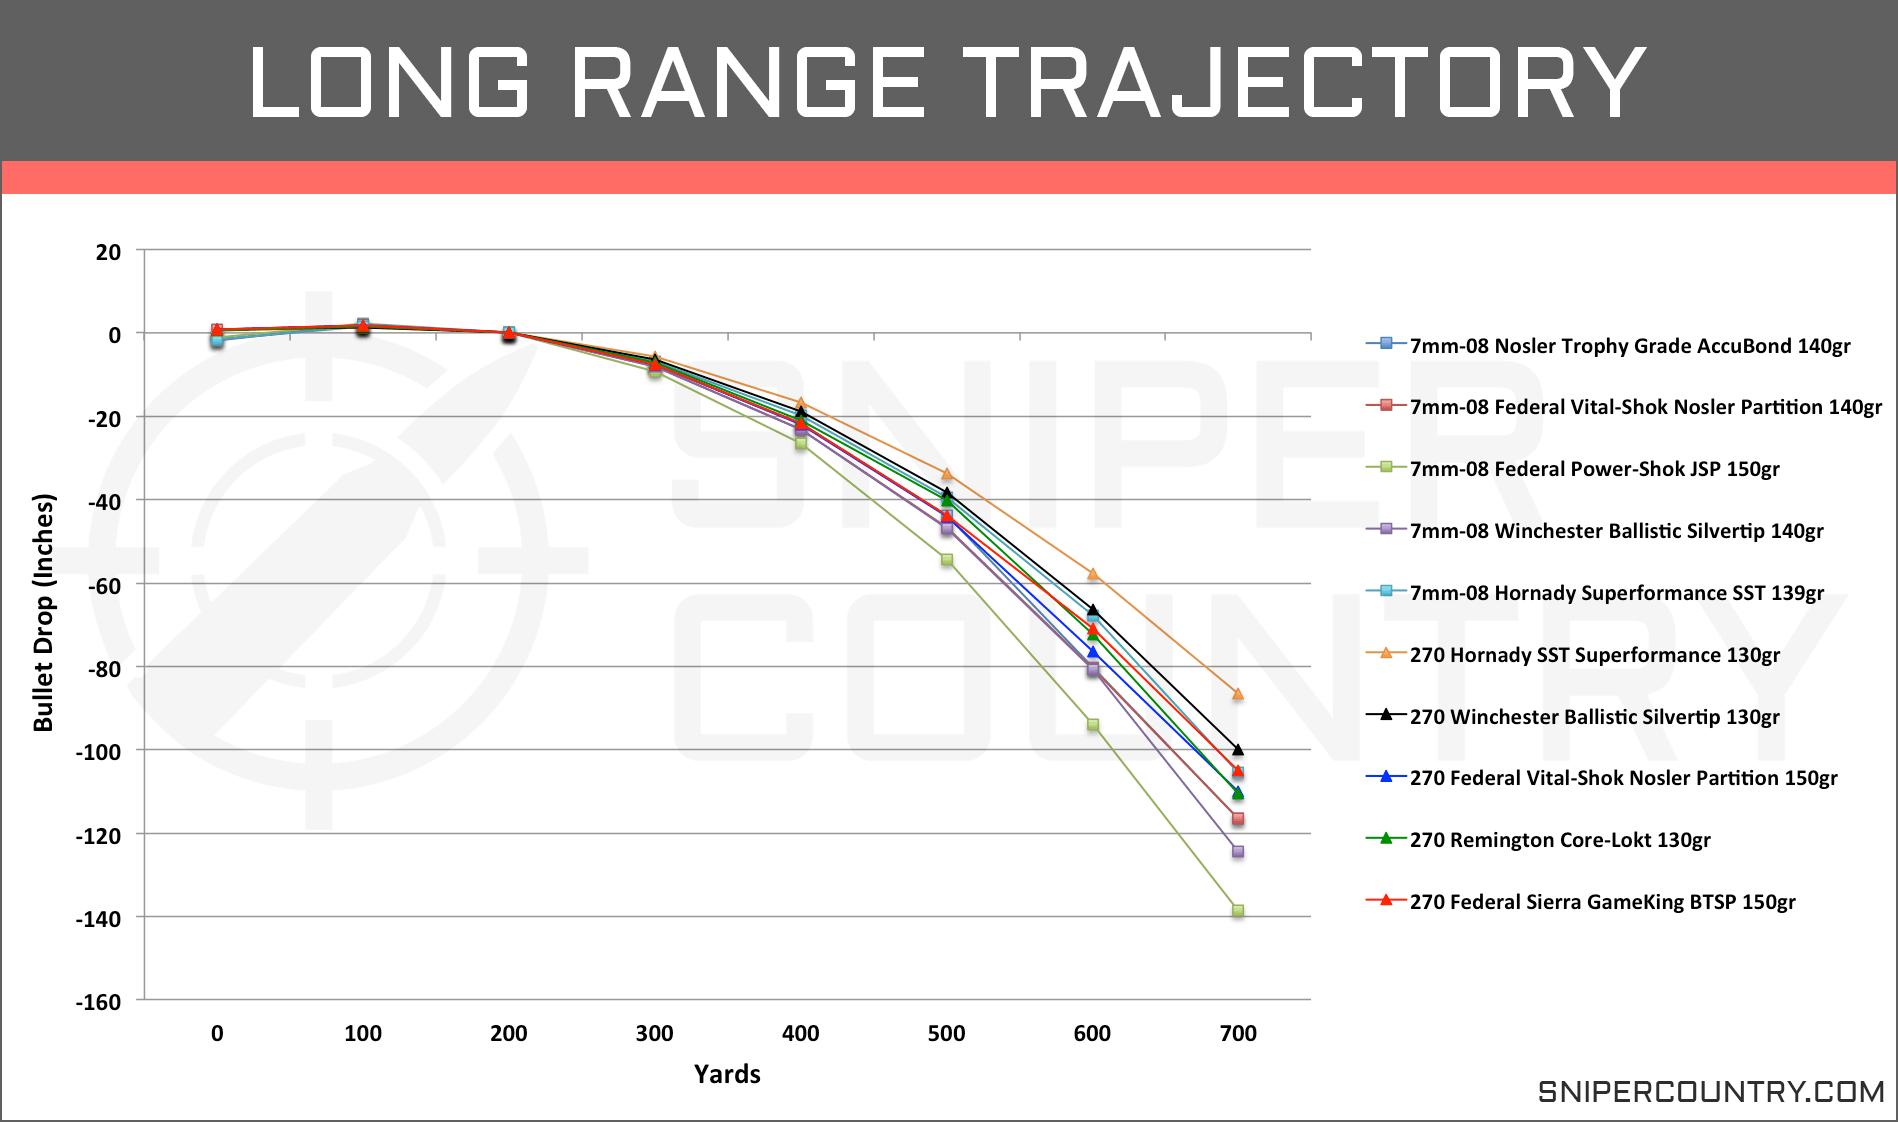 Long Range Trajectory 7mm-08 Rem vs .270 Win